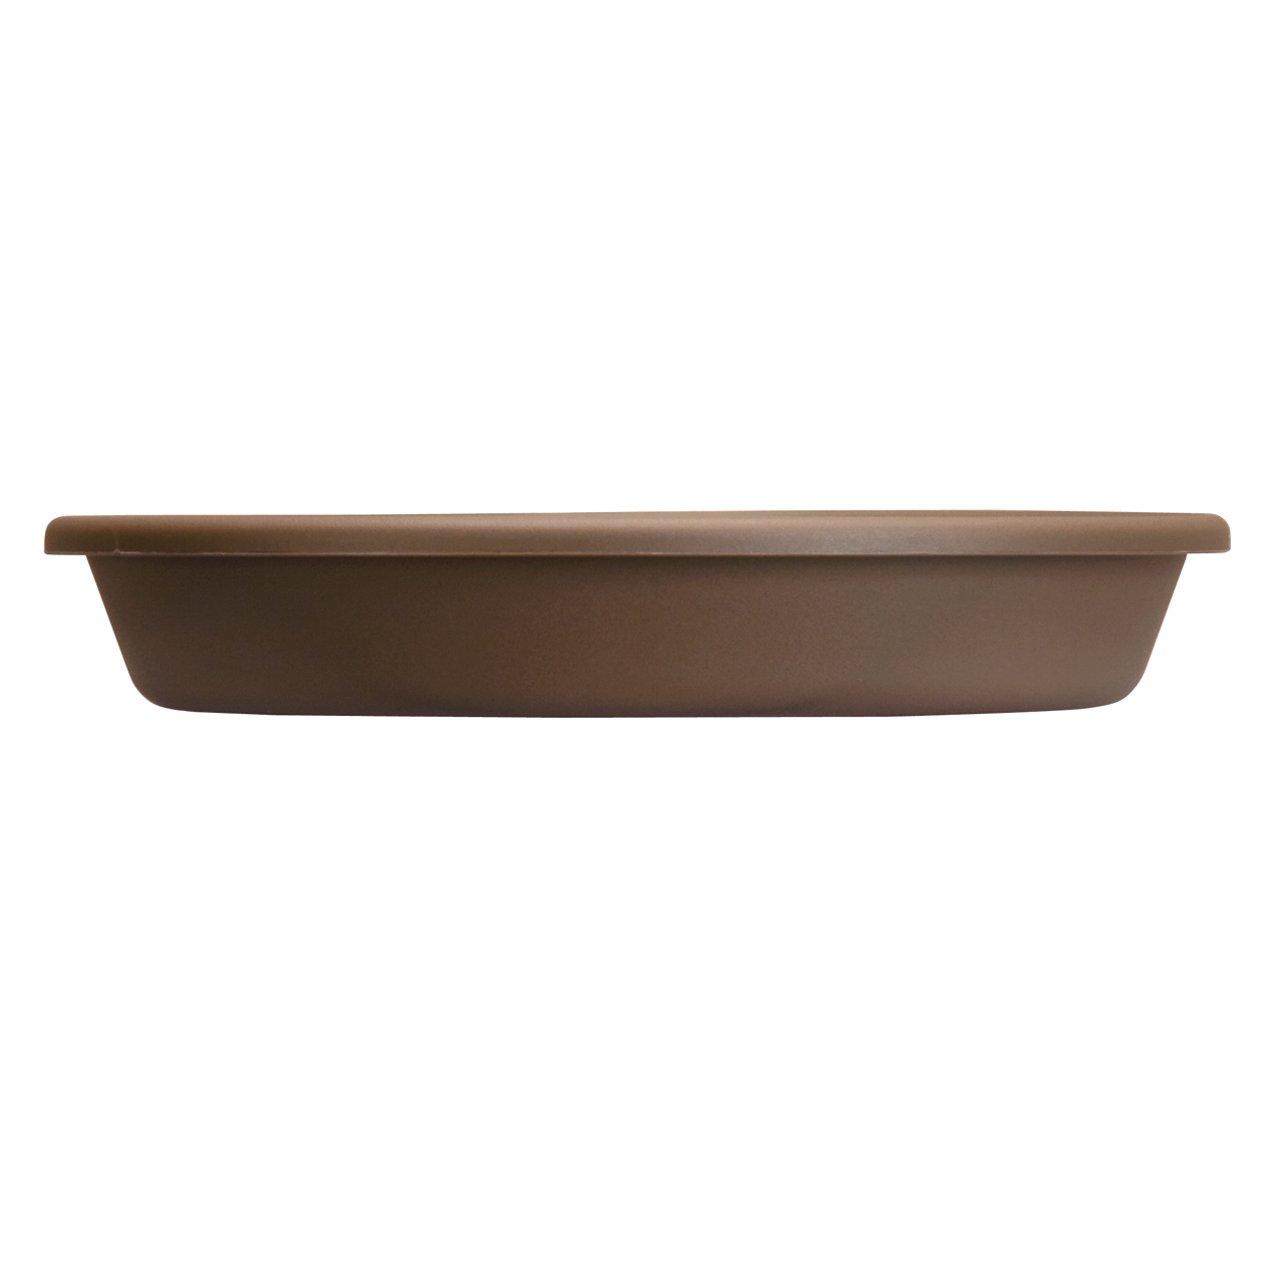 Akro Mils SLI12000E21 Classic Saucer for 12-Inch Classic Pot, Chocolate, 12.5-Inch